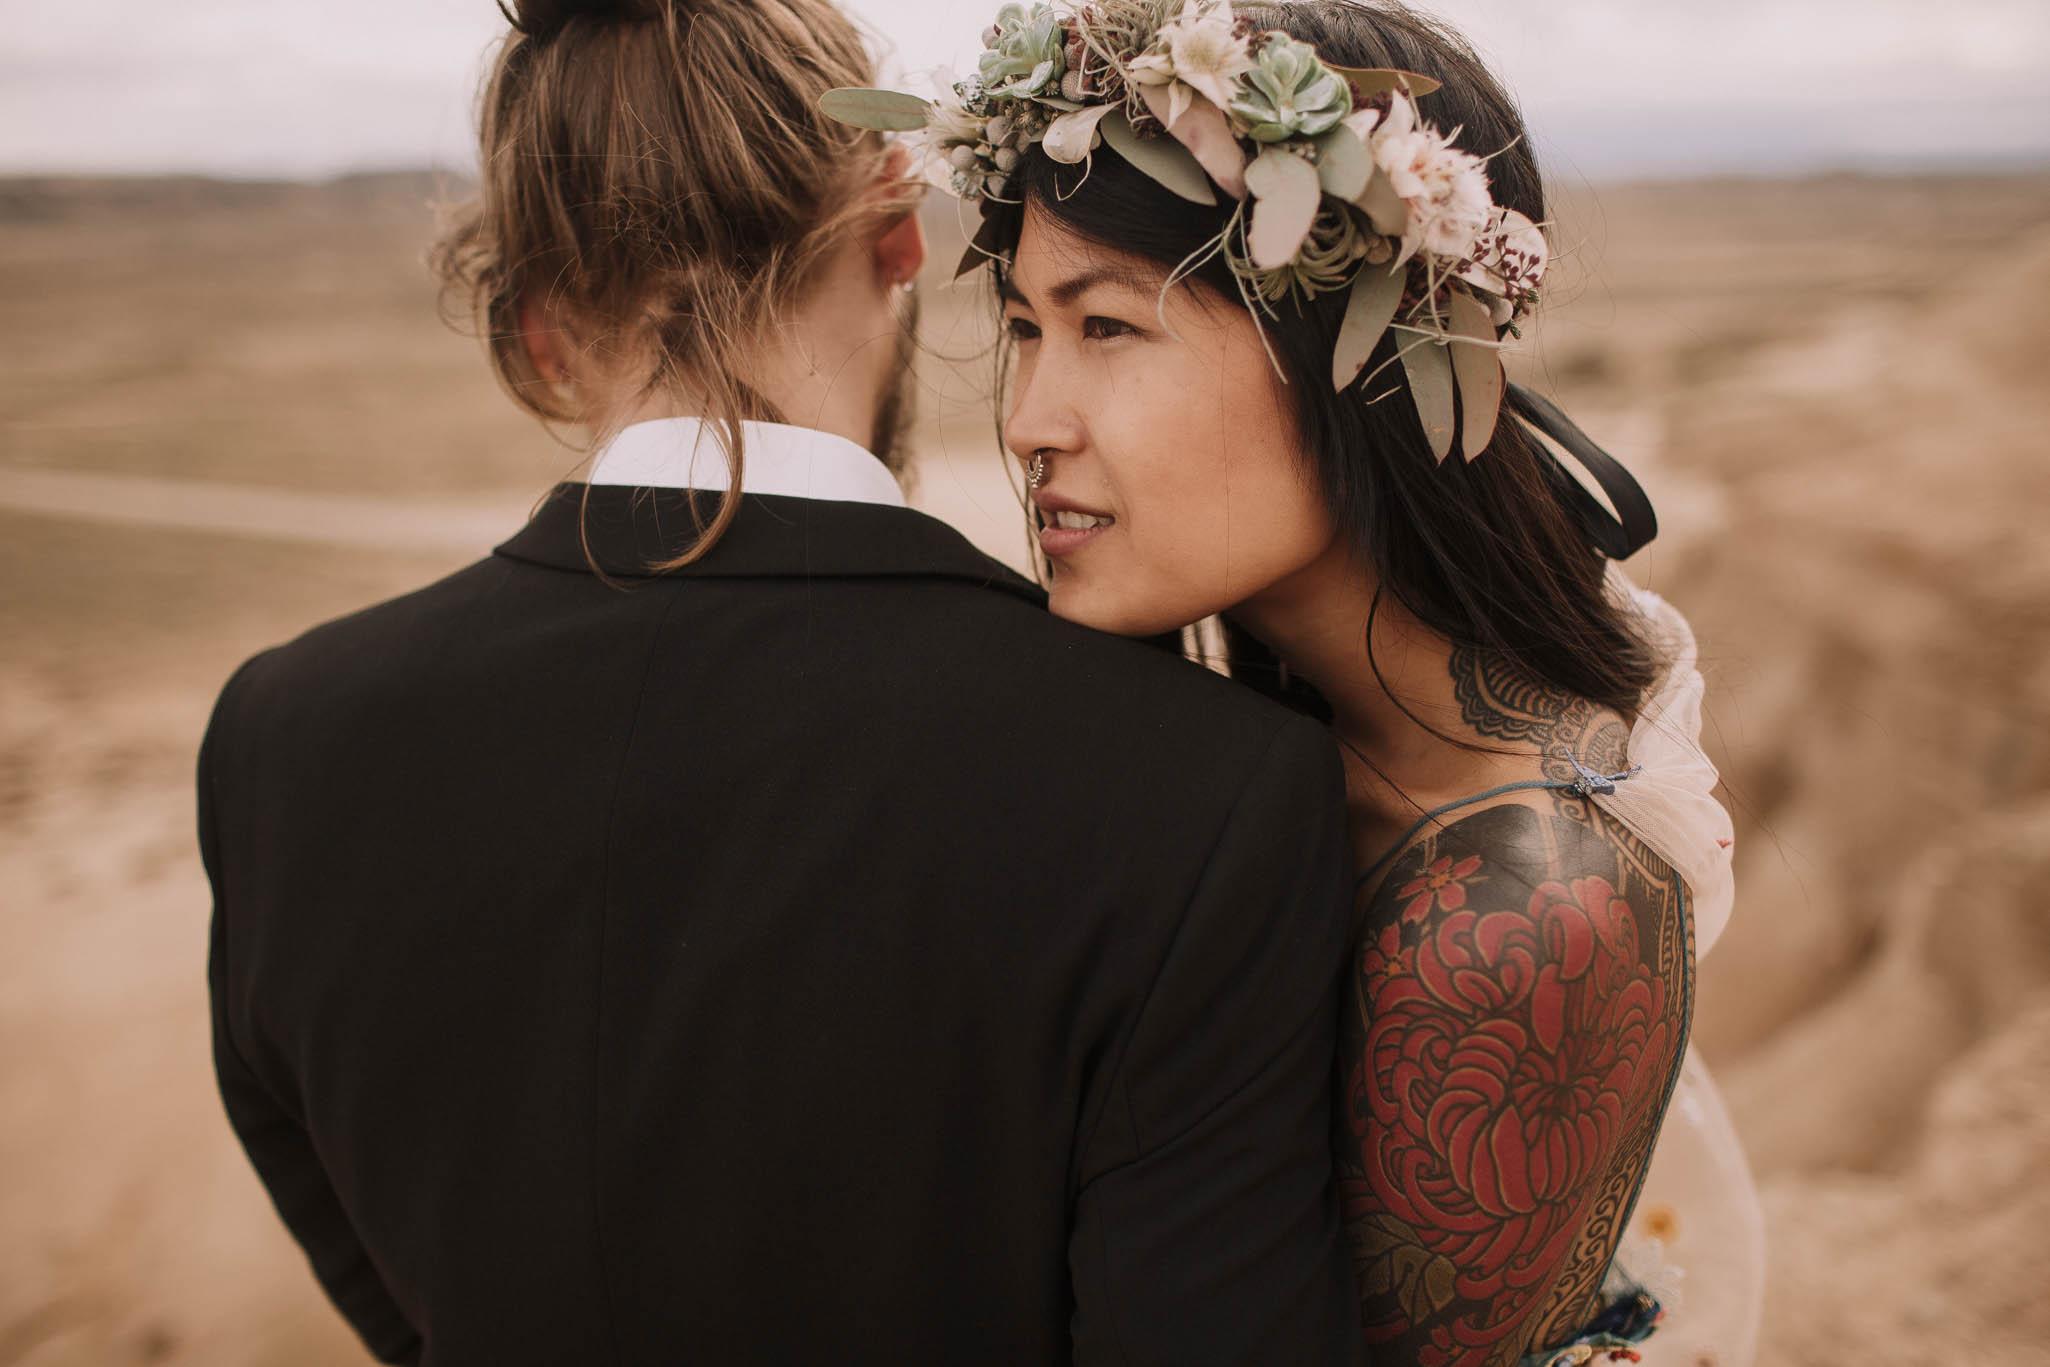 Spain-wedding-photographer-bardenas-reales-jeremy-boyer-photographe-mariage-bordeaux-floral-wedding-dress-robe-125.jpg